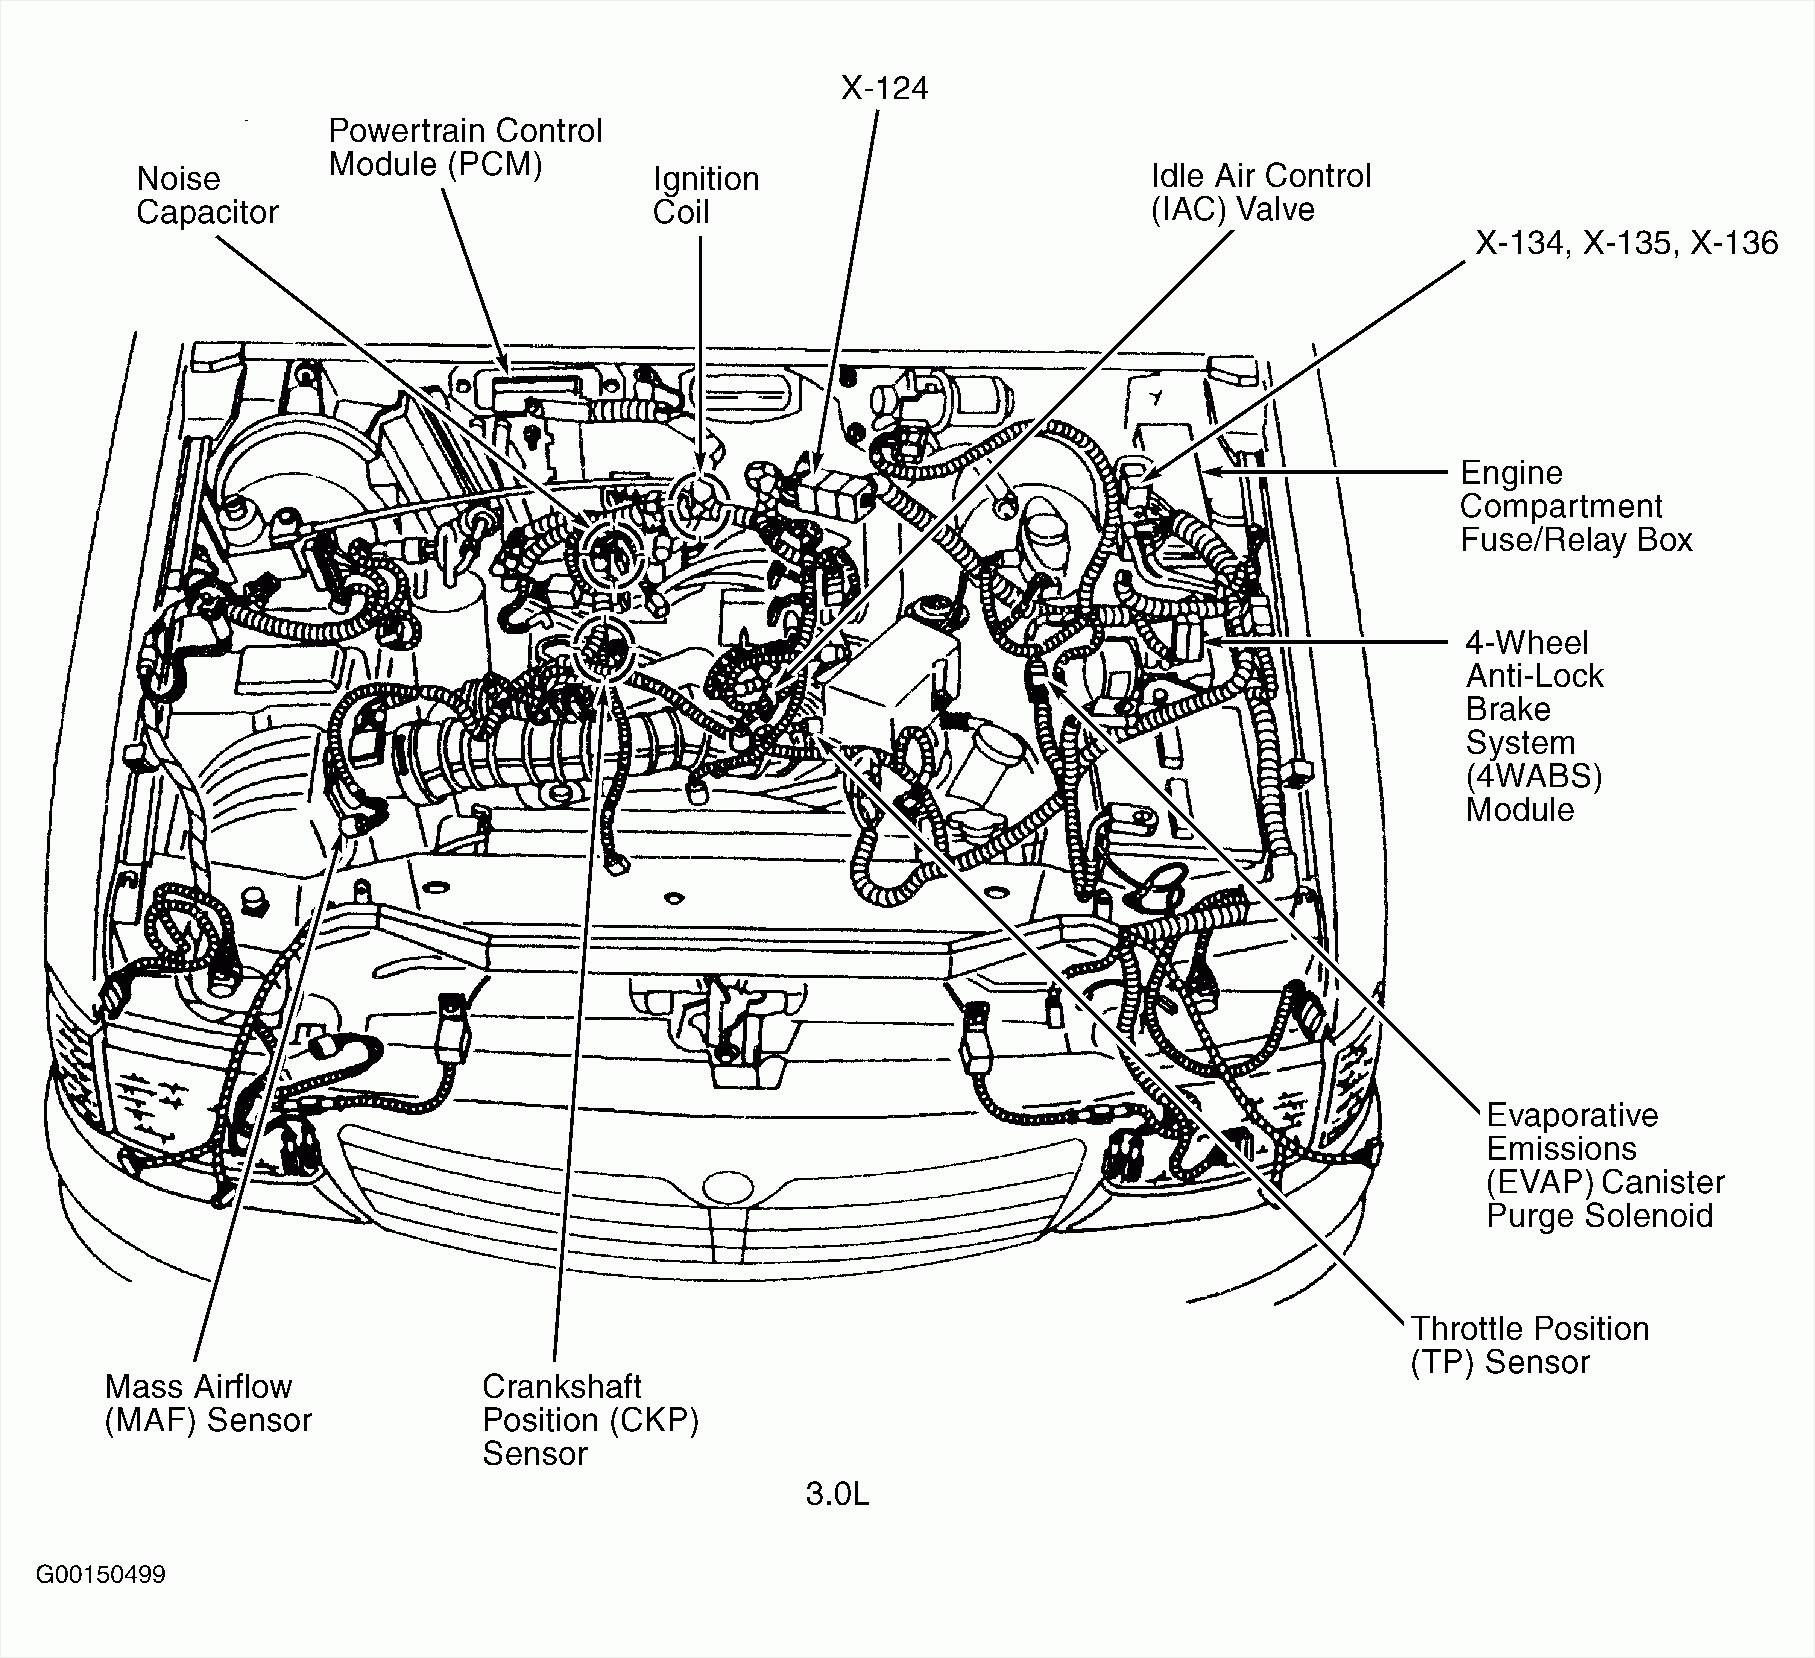 2004 ford Freestar Engine Diagram ford Escape 3 0 Engine Diagram Of 2004 ford Freestar Engine Diagram